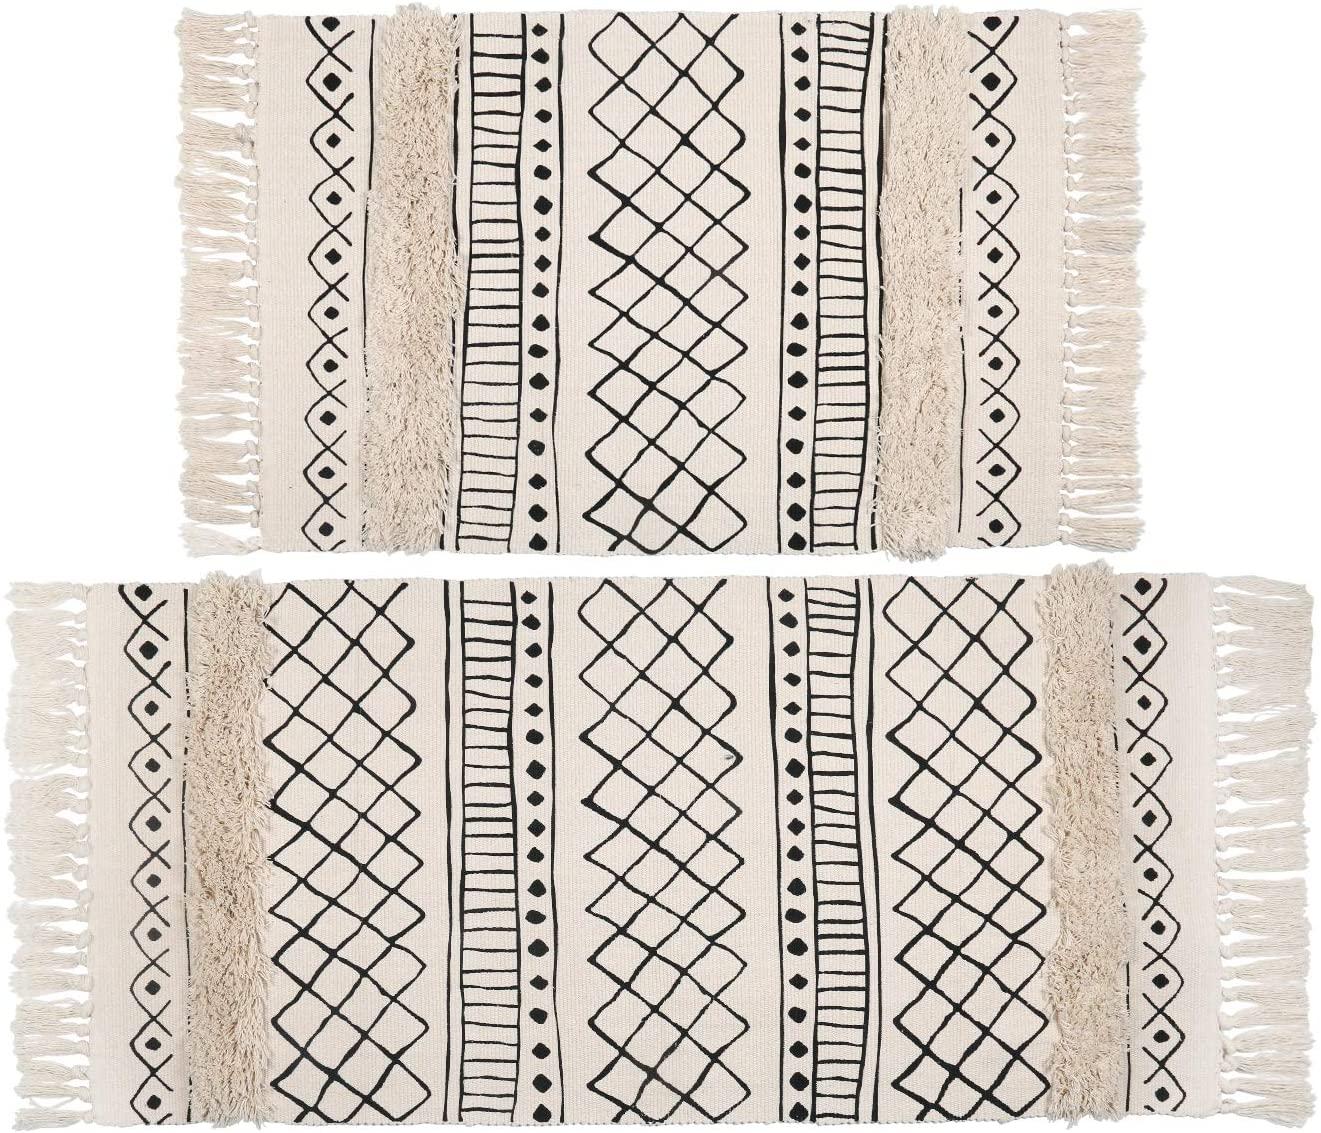 Topotdor Tufted Cotton Area Rug 2 Pieces,Hand Woven Print Boho Tassels Floor Rugs Perfect Bedroom Living Room Hallway Home Decor(2' x 3'+ 2' x 4', White Skyline)